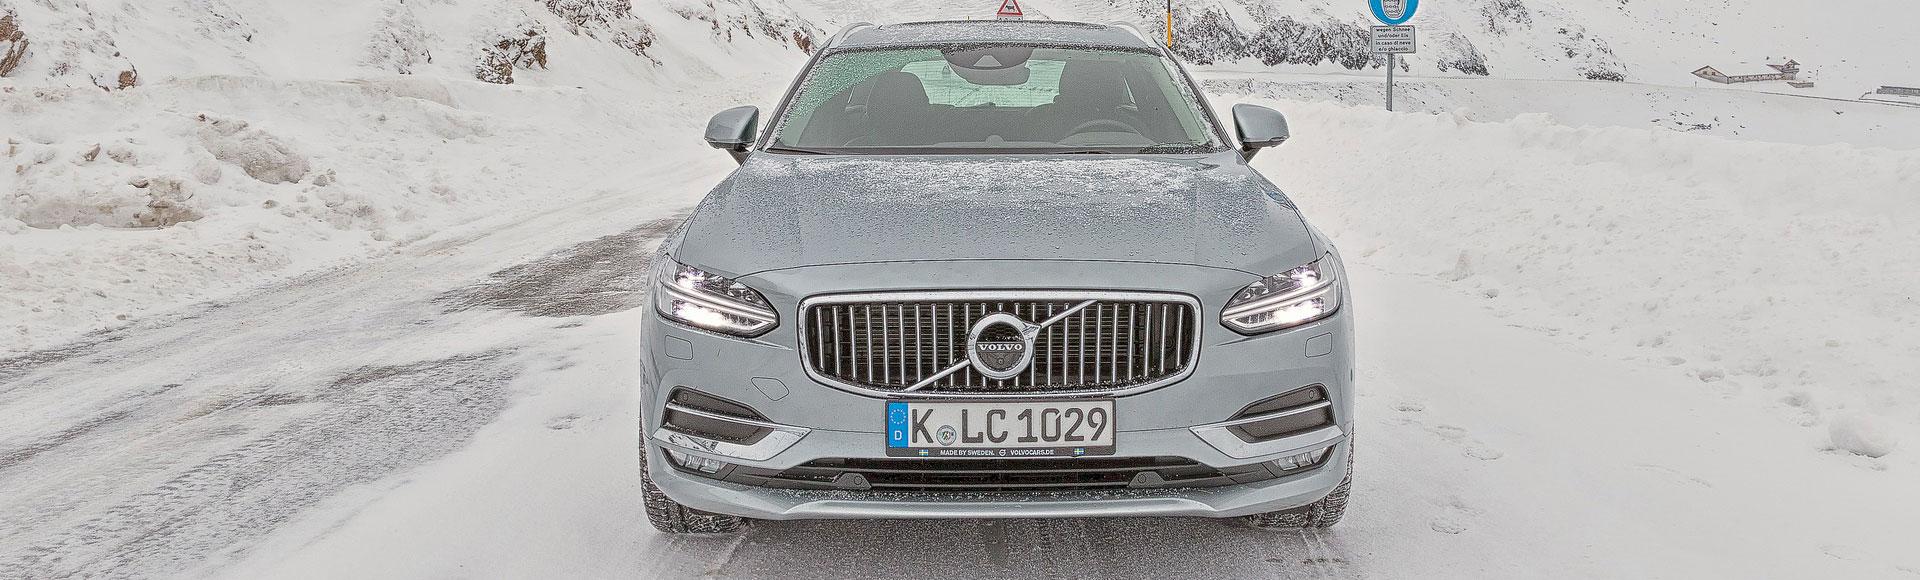 Volvo V90 2016 184 Winter